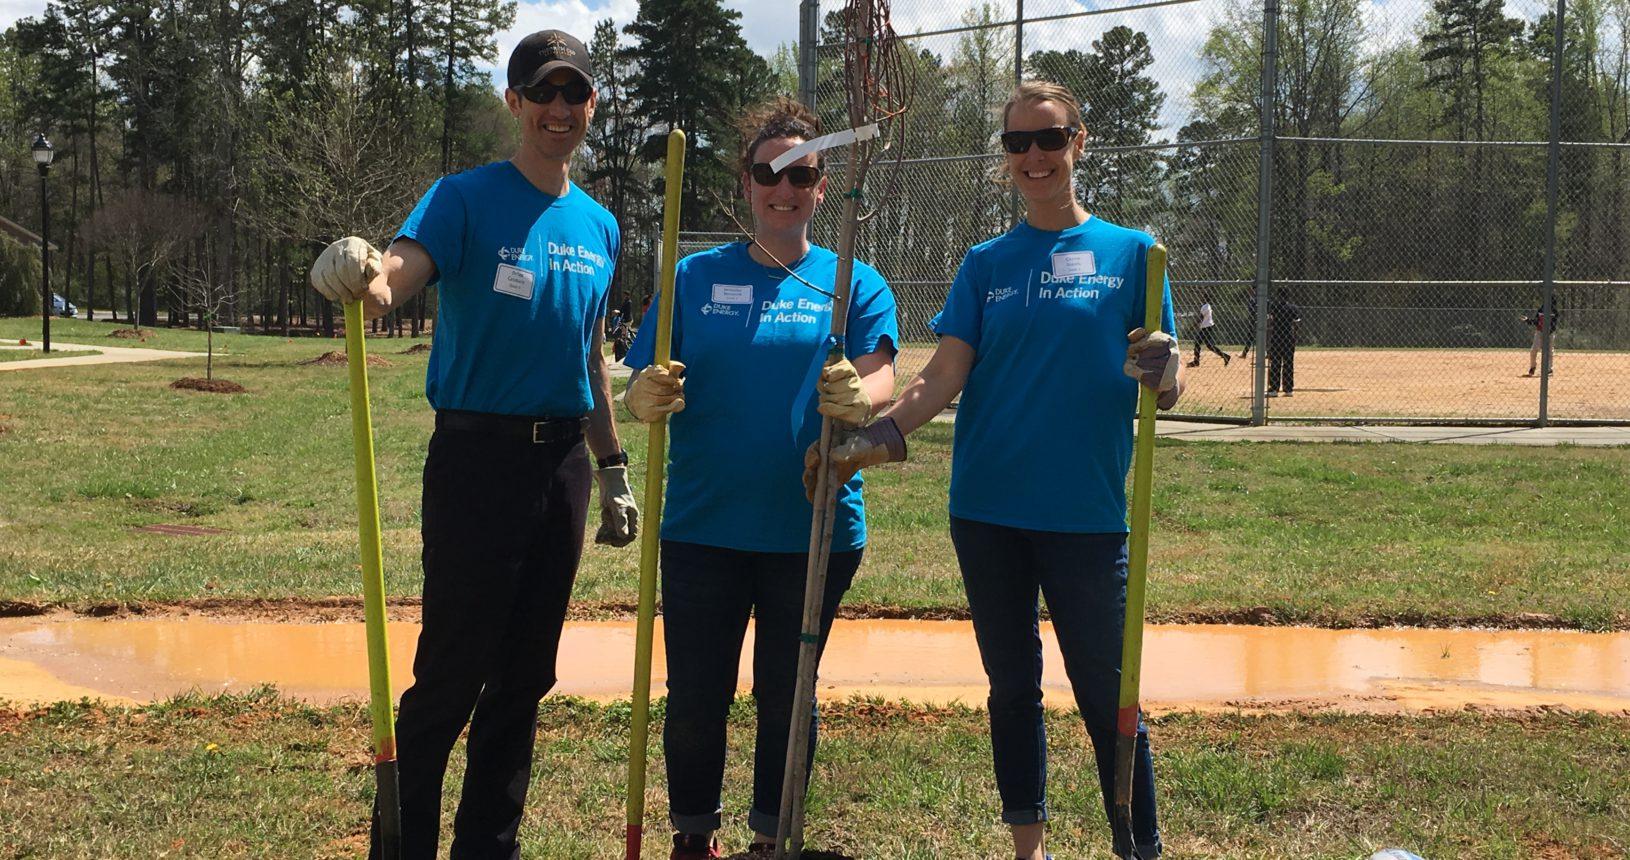 Briarwood Park Planting Trees Charlotte Nonprofit